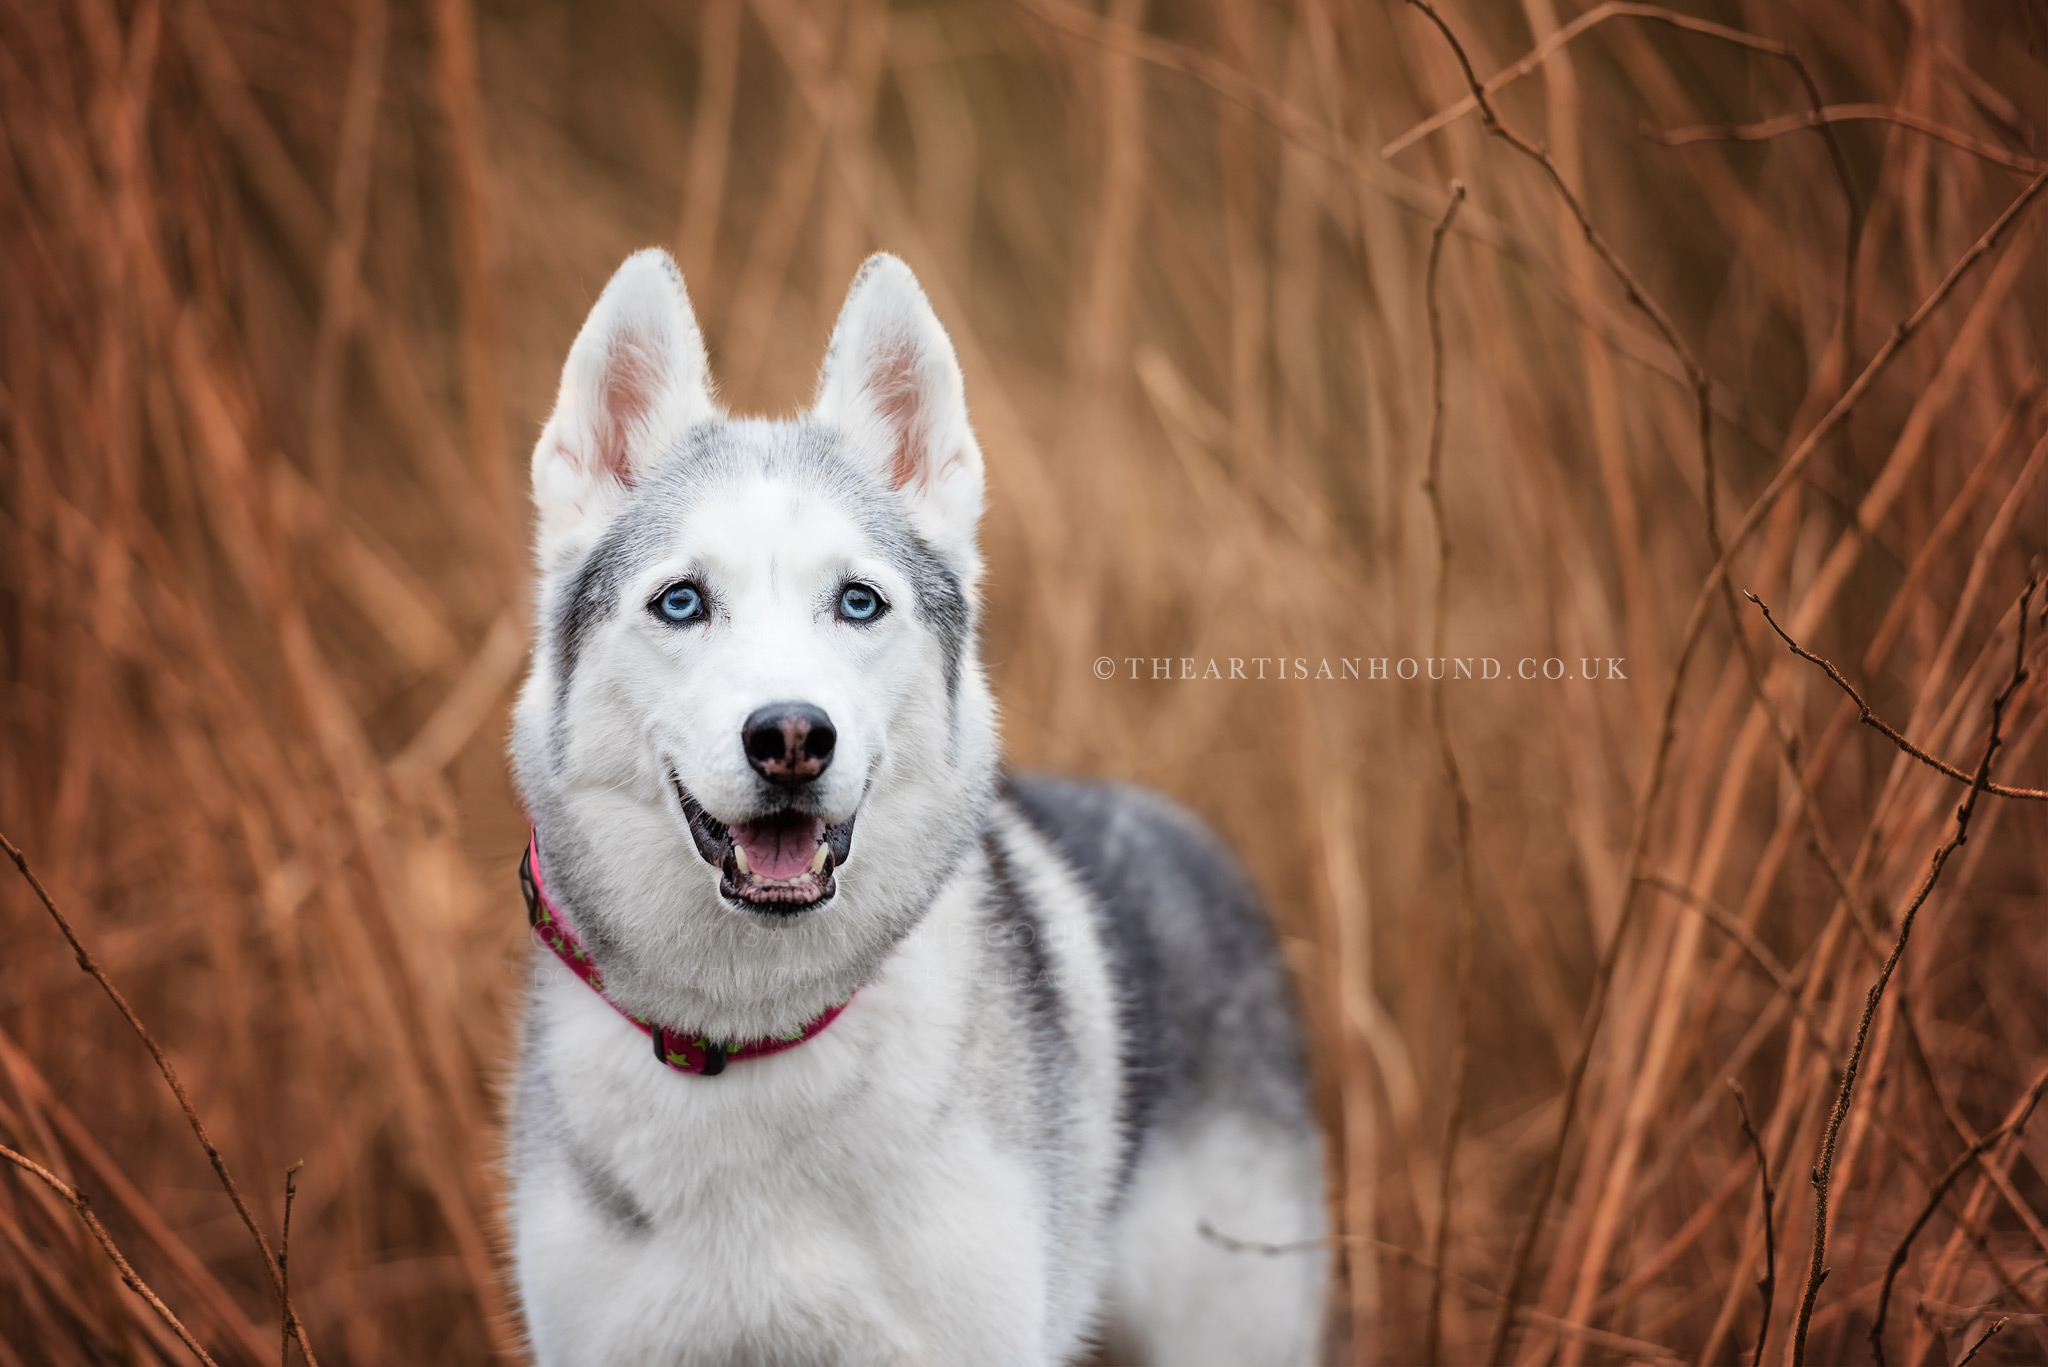 Siberian husky dog standing in tall brown grass